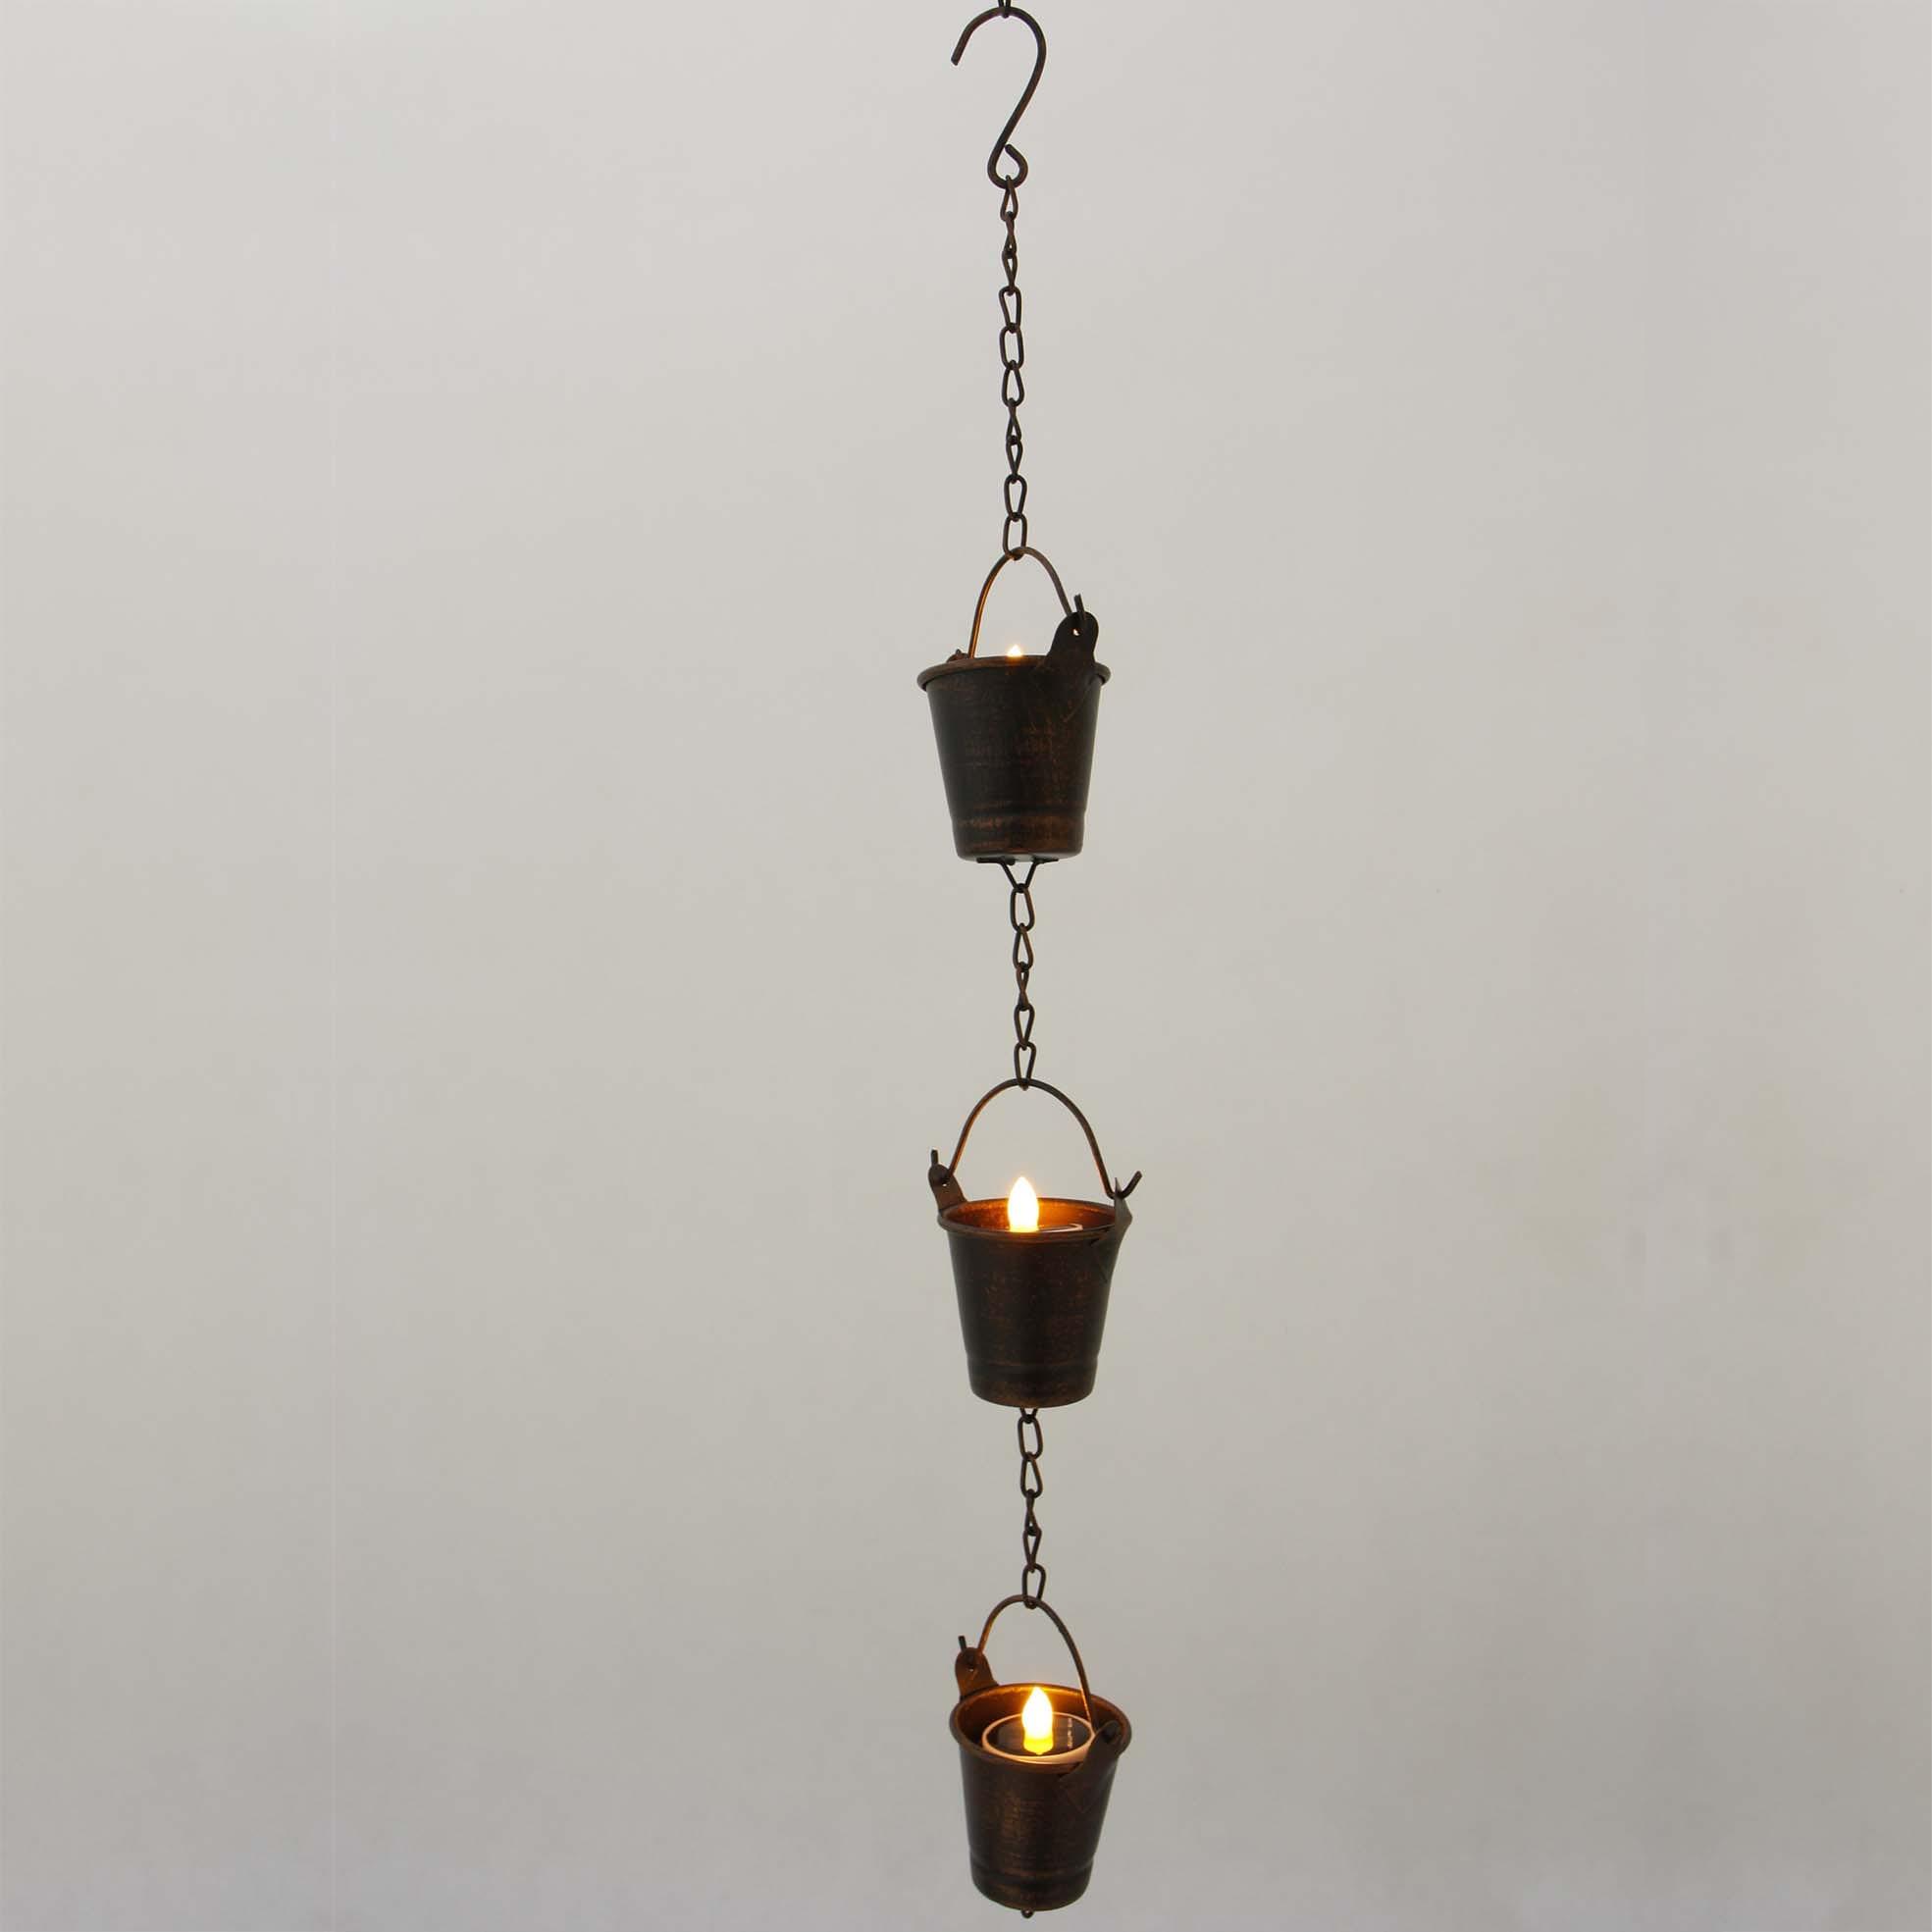 Hanging LED Tea Light Holder  MYHH05011 Featured Image